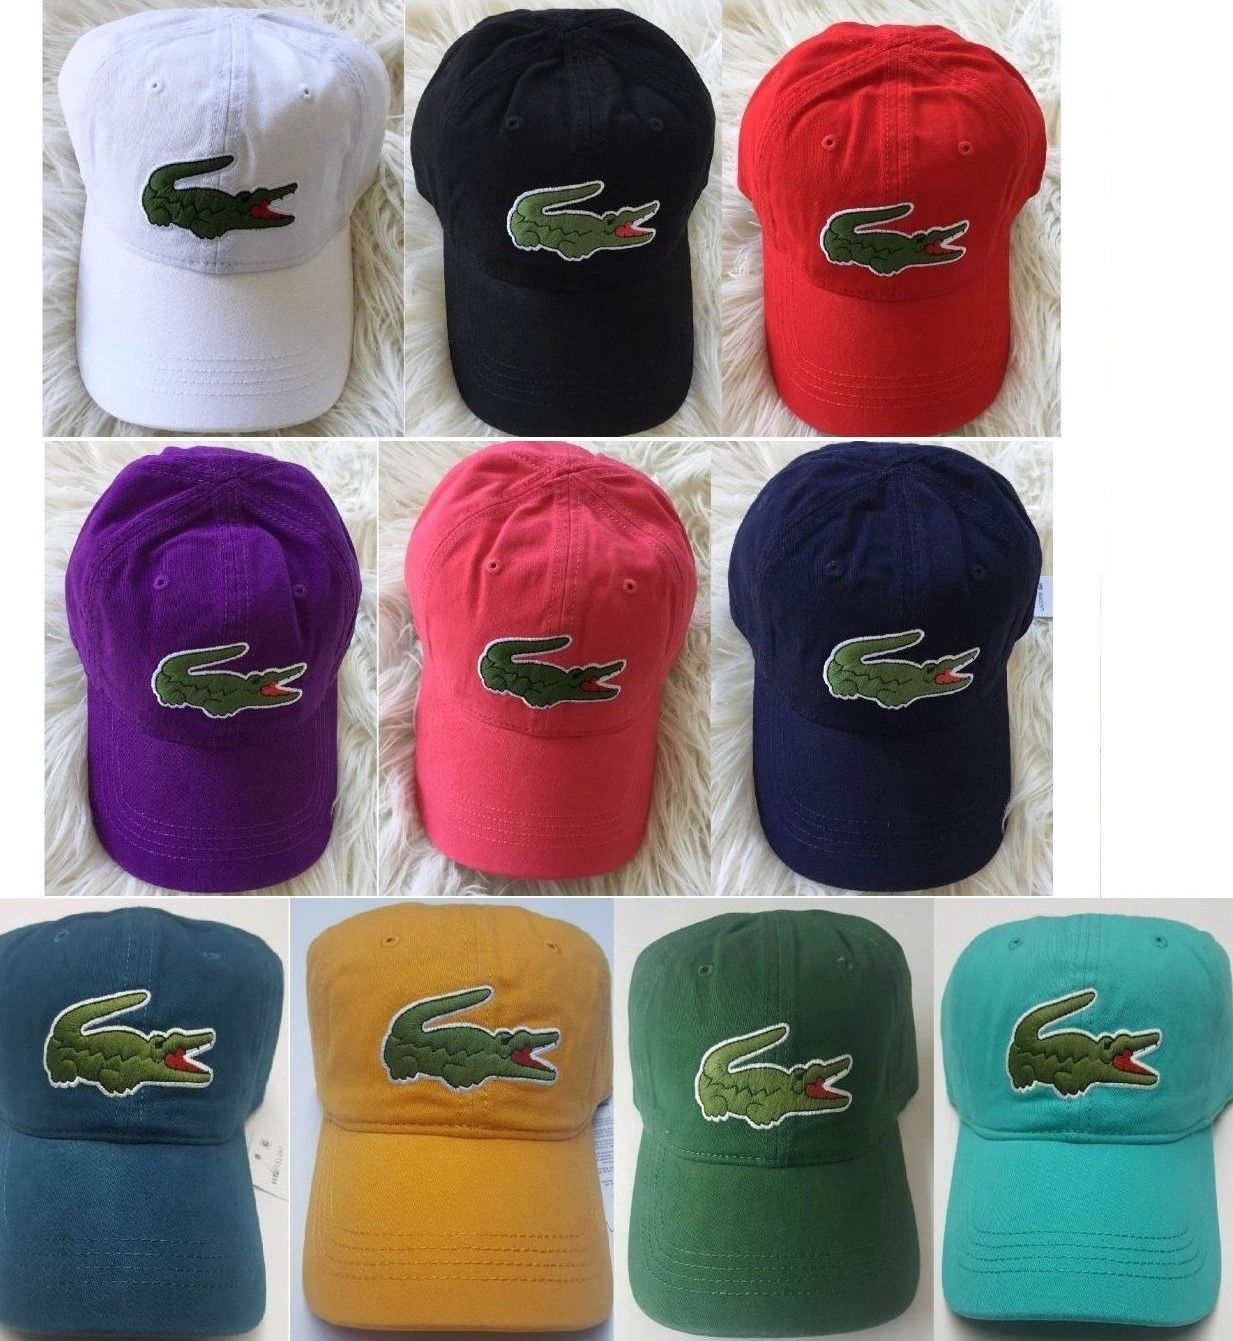 a08d353ce3b Hats 52365  Lacoste Mens Big Croc Gabardine Adjustable Cap Hat